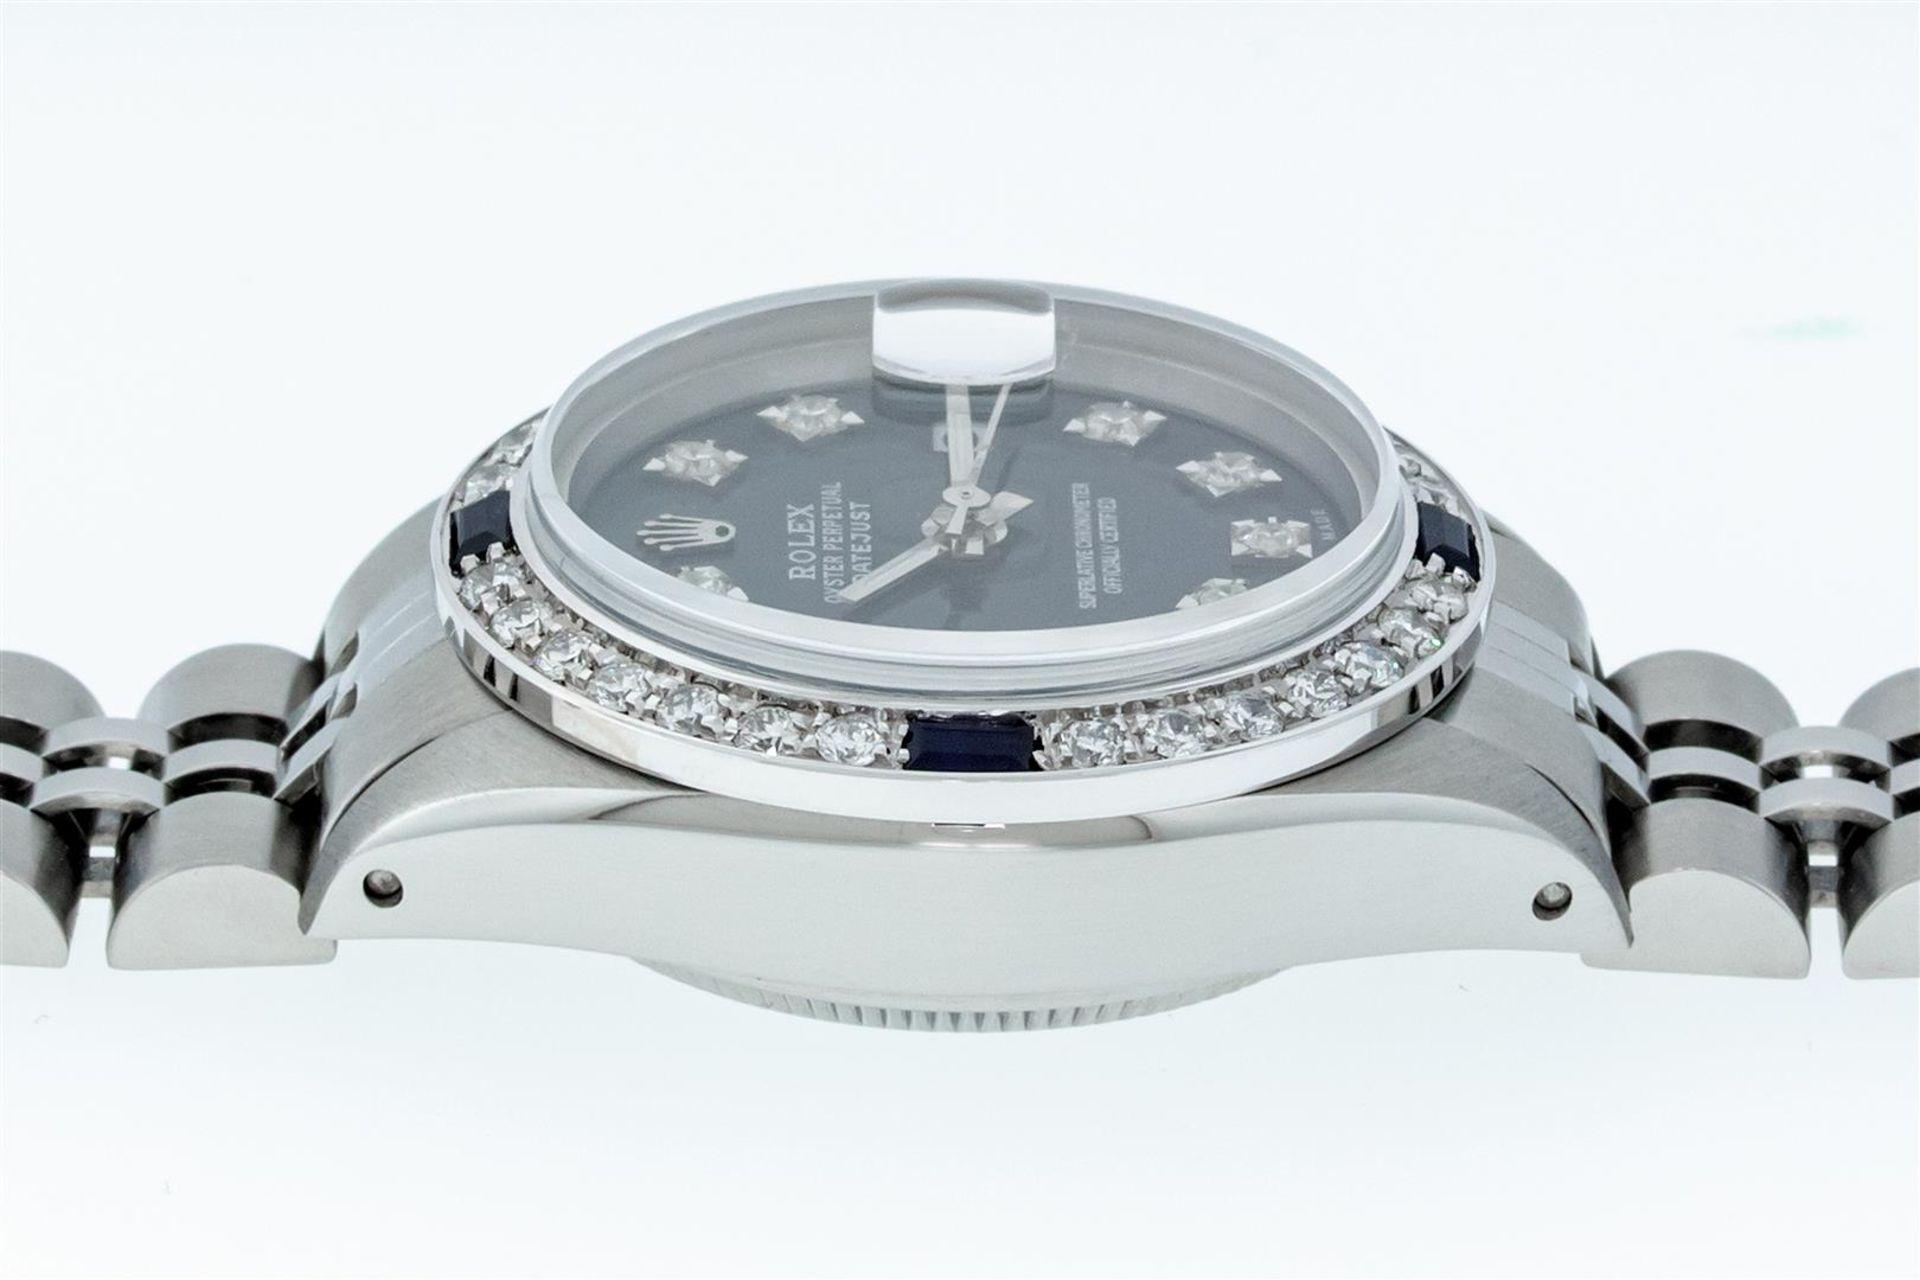 Rolex Ladies Stainless Steel Blue VVS Diamond & Sapphire Datejust Wristwatch - Image 6 of 9